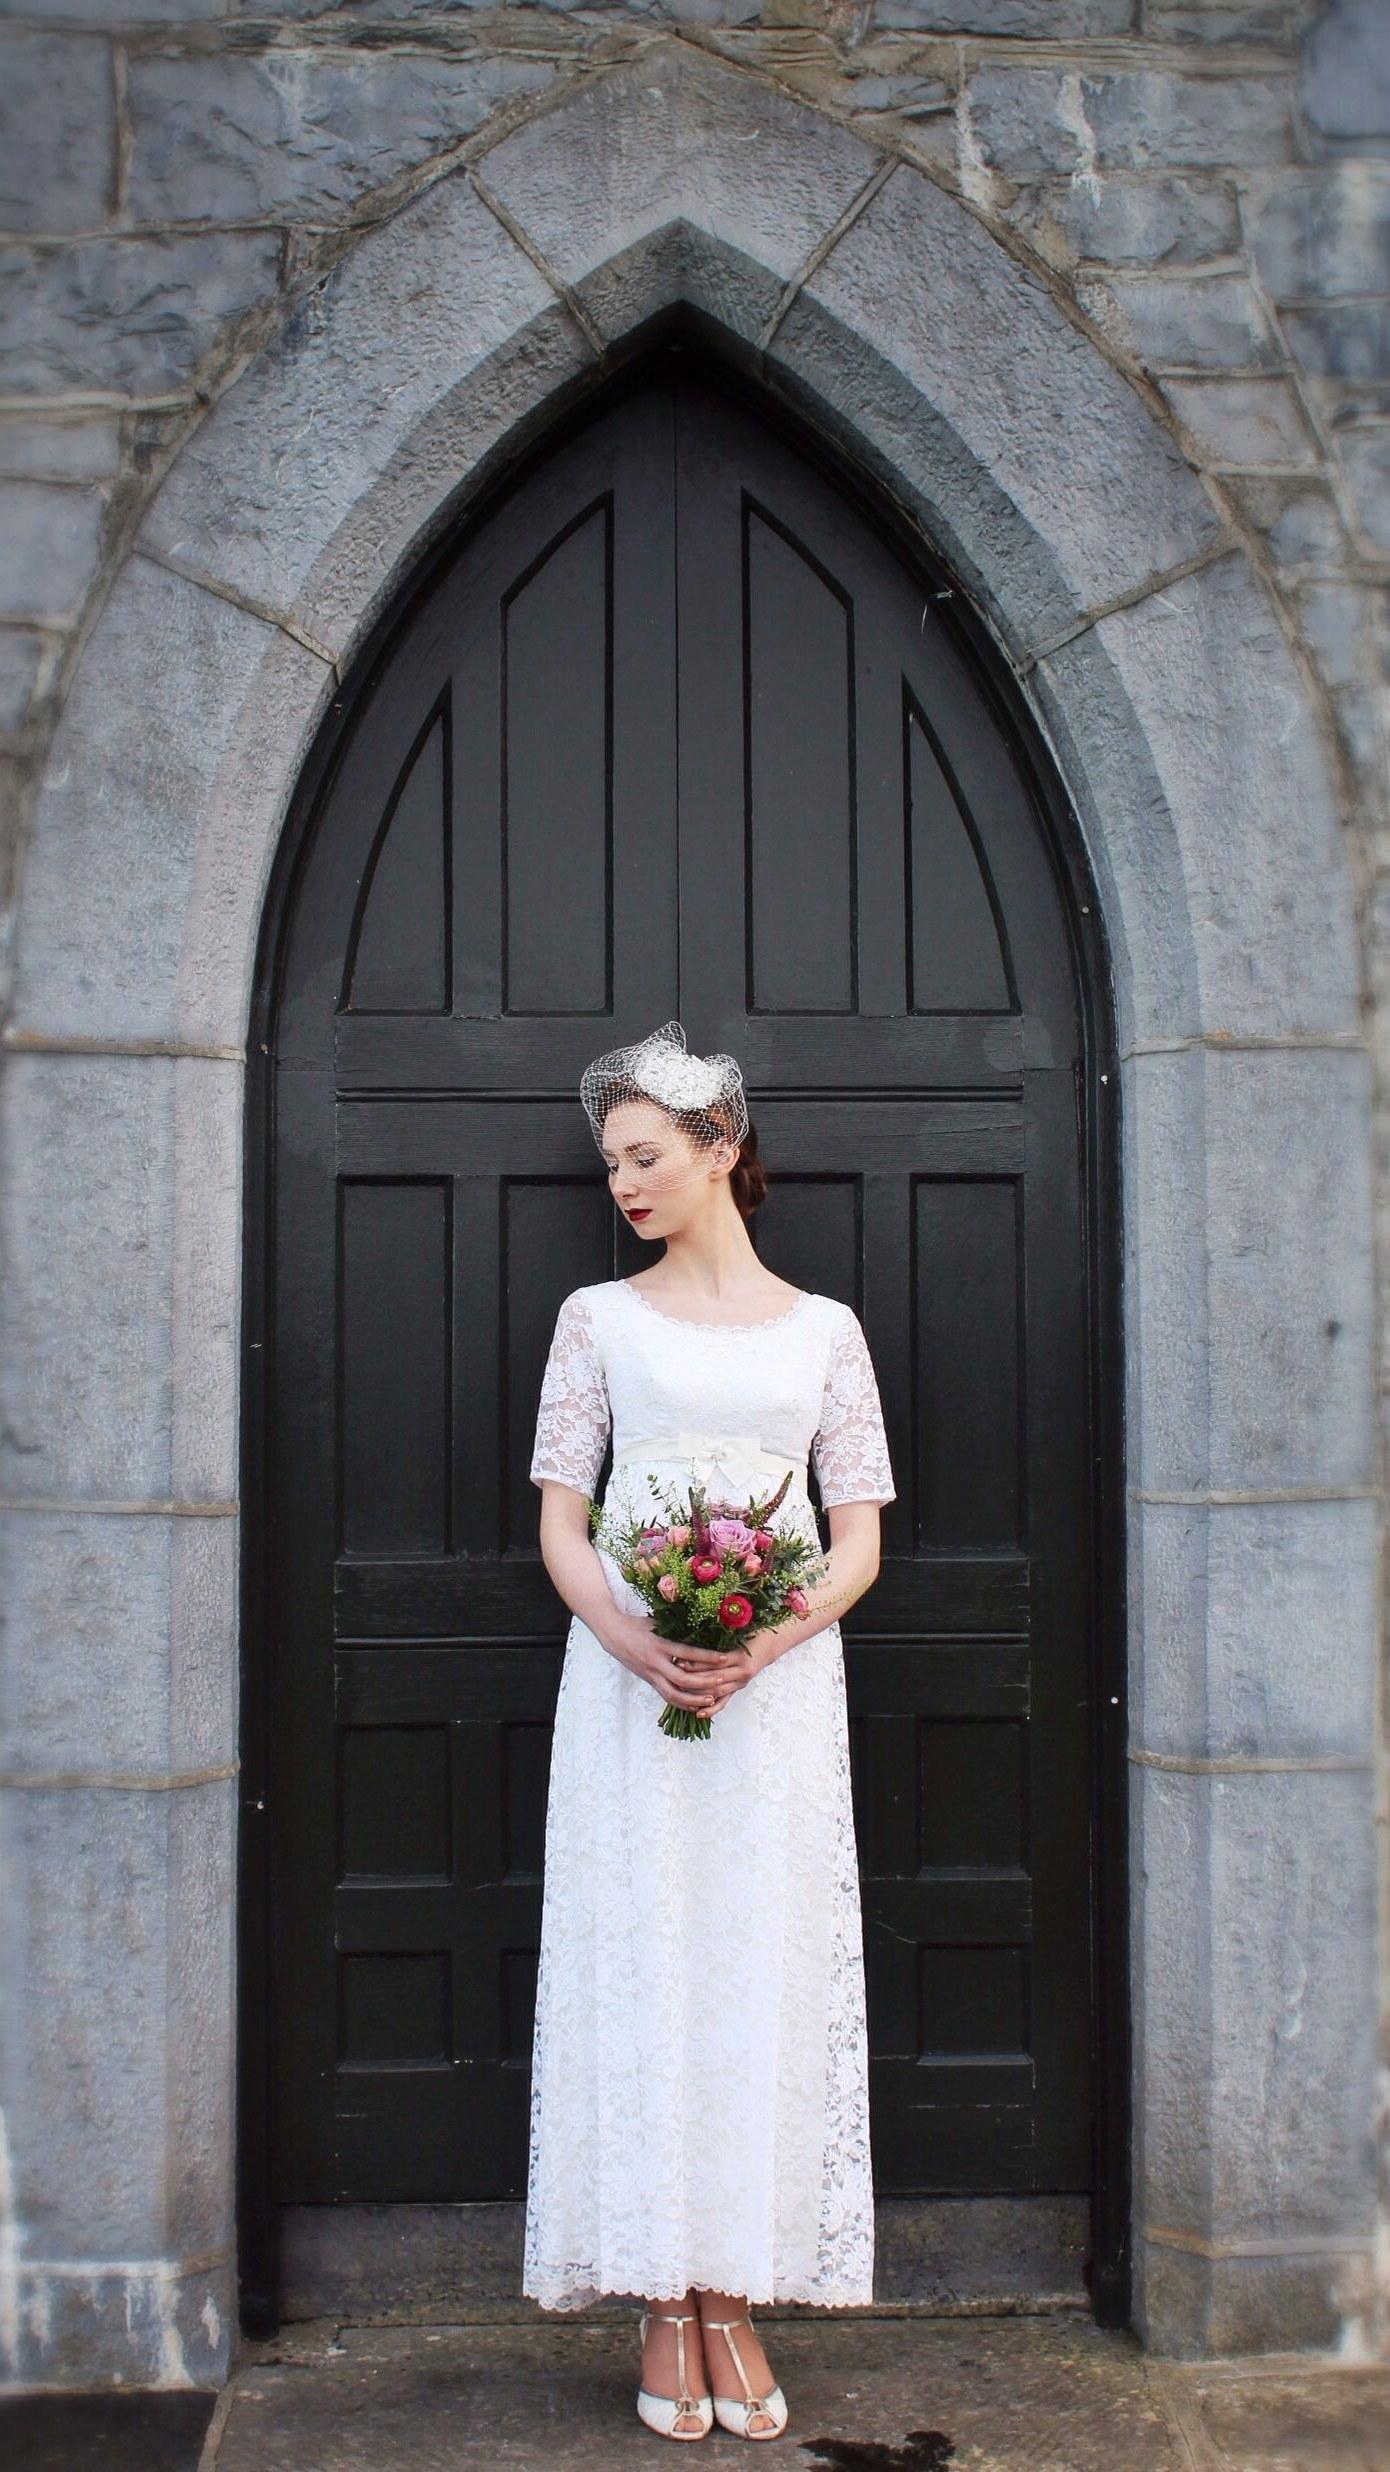 Model Vintage Bridesmaid Dress Hijab Wddj Pin On Kathryn S Wedding